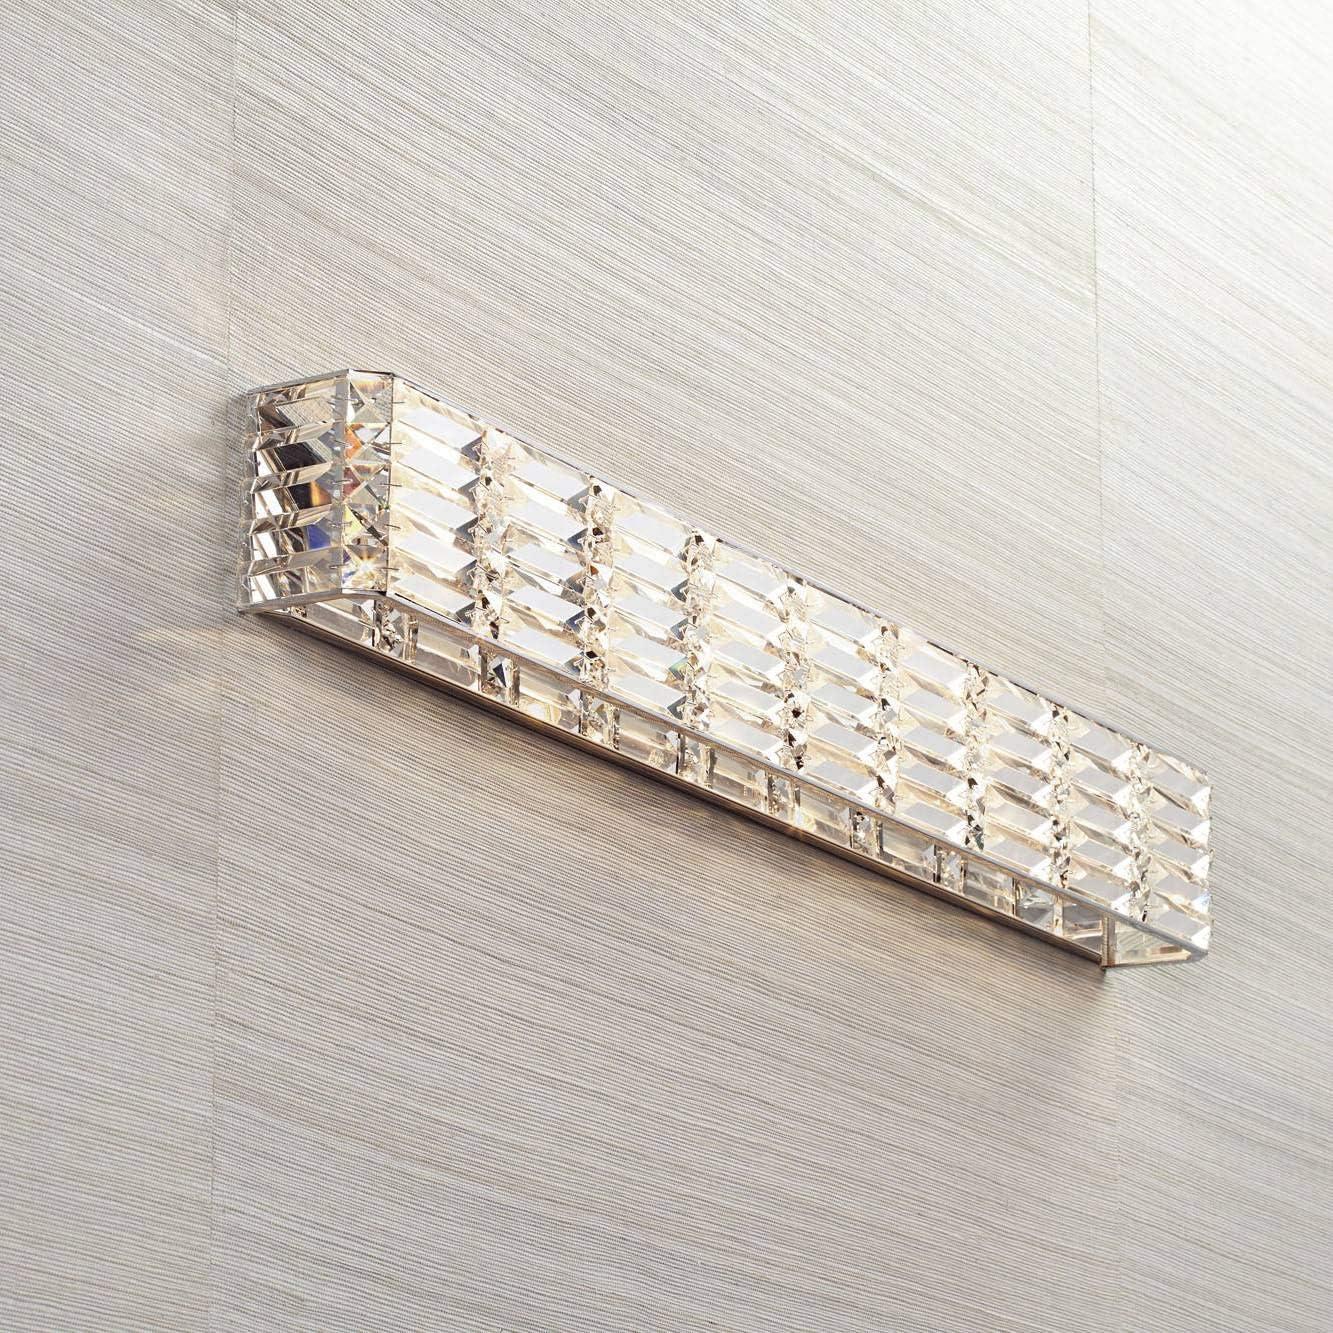 "Vivienne Modern Wall Light Chrome Cut Crystal 35"" Vanity Fixture Bathroom Over Mirror Bedroom - Possini Euro Design 814jVamgf1L"